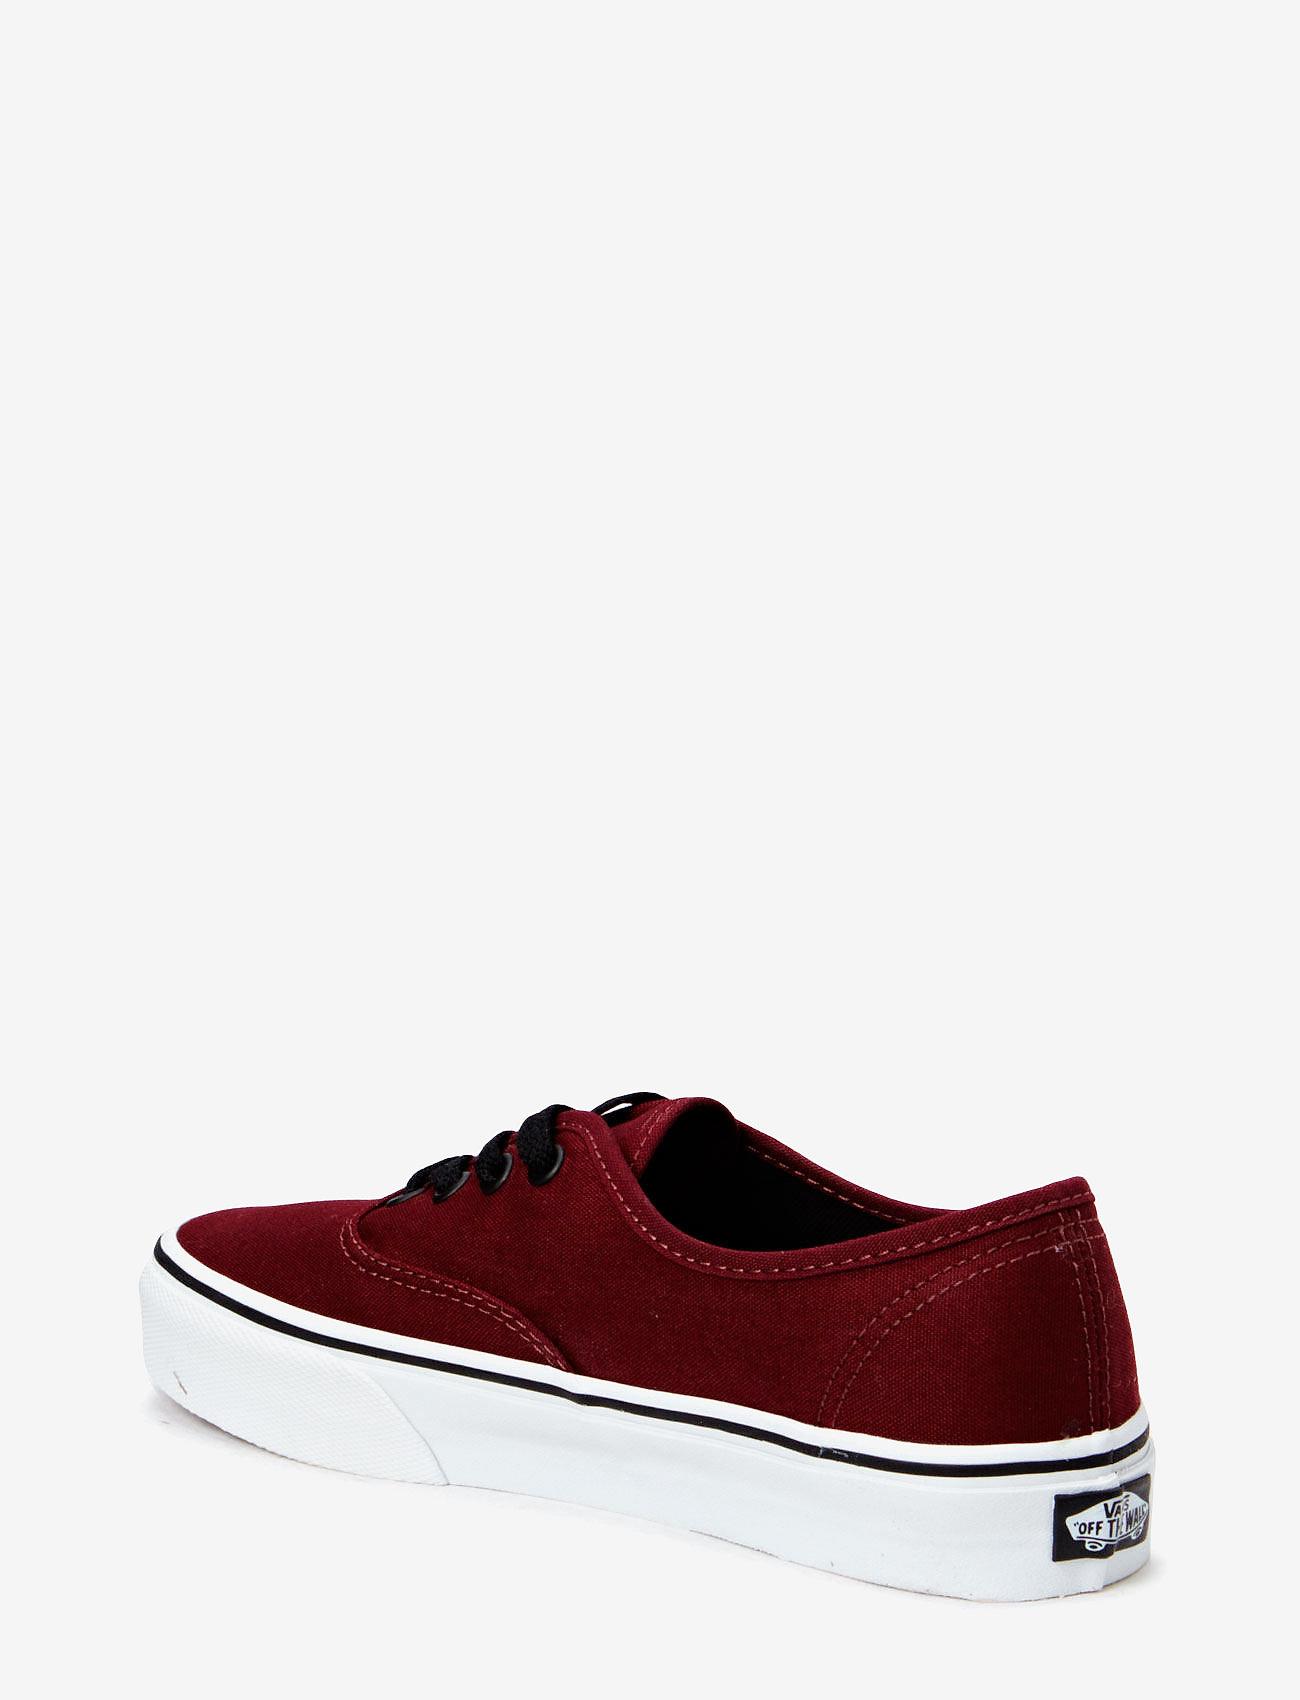 VANS - UA Authentic - laag sneakers - port royale/black - 1